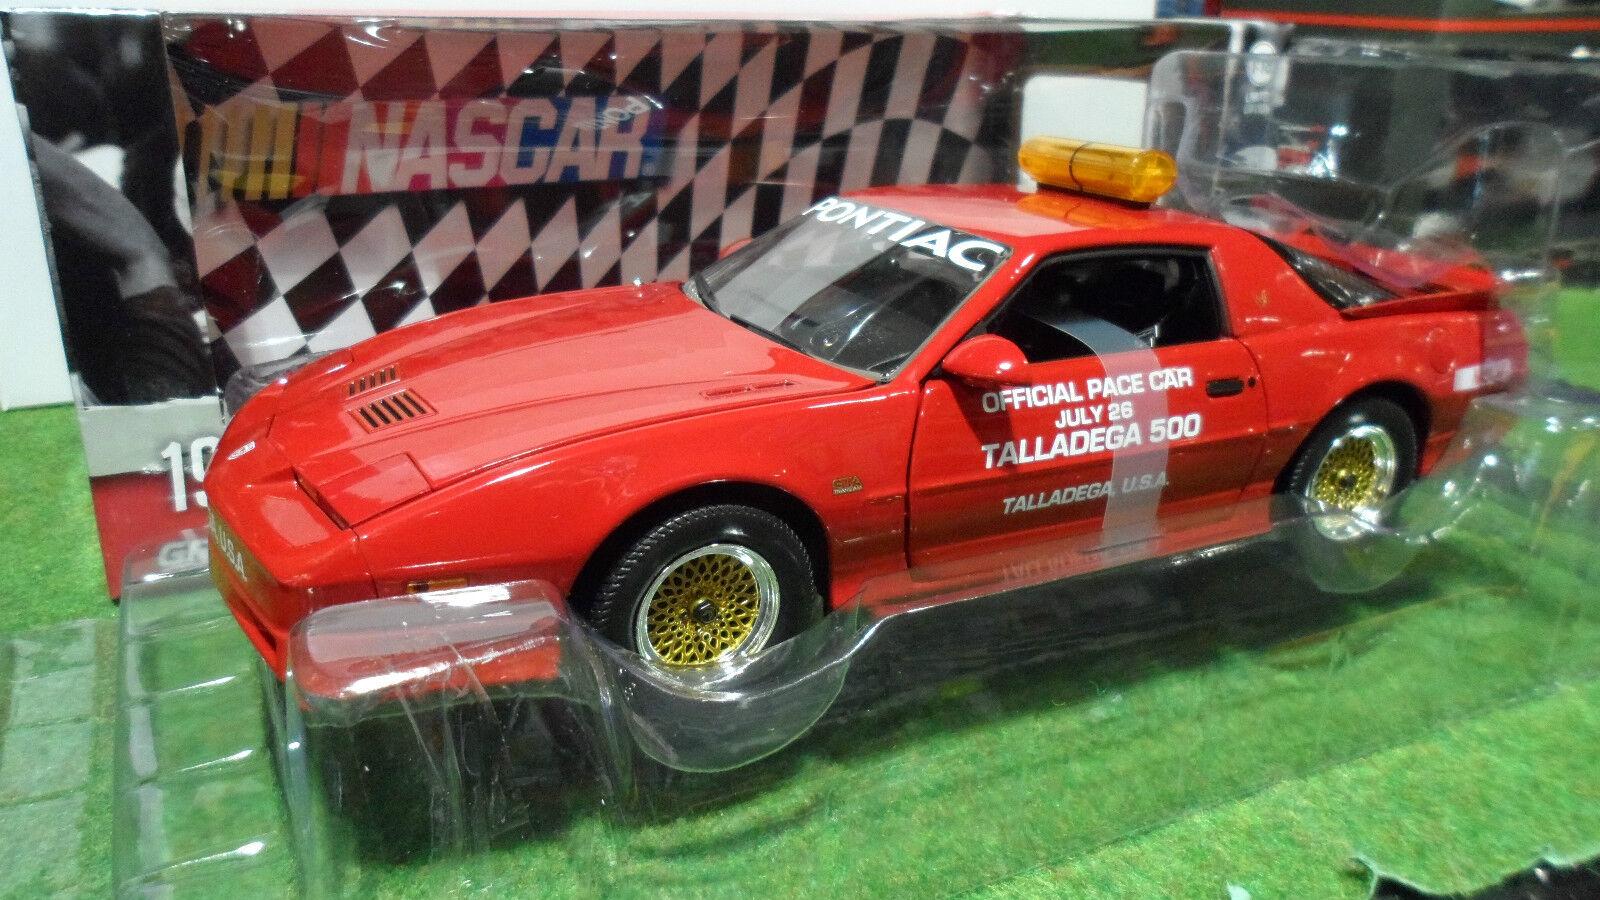 PONTIAC GTA TailleDEGA 500 Pace Car NASCAR 1987 au 1 18 vertLIGHT 12859 voiture